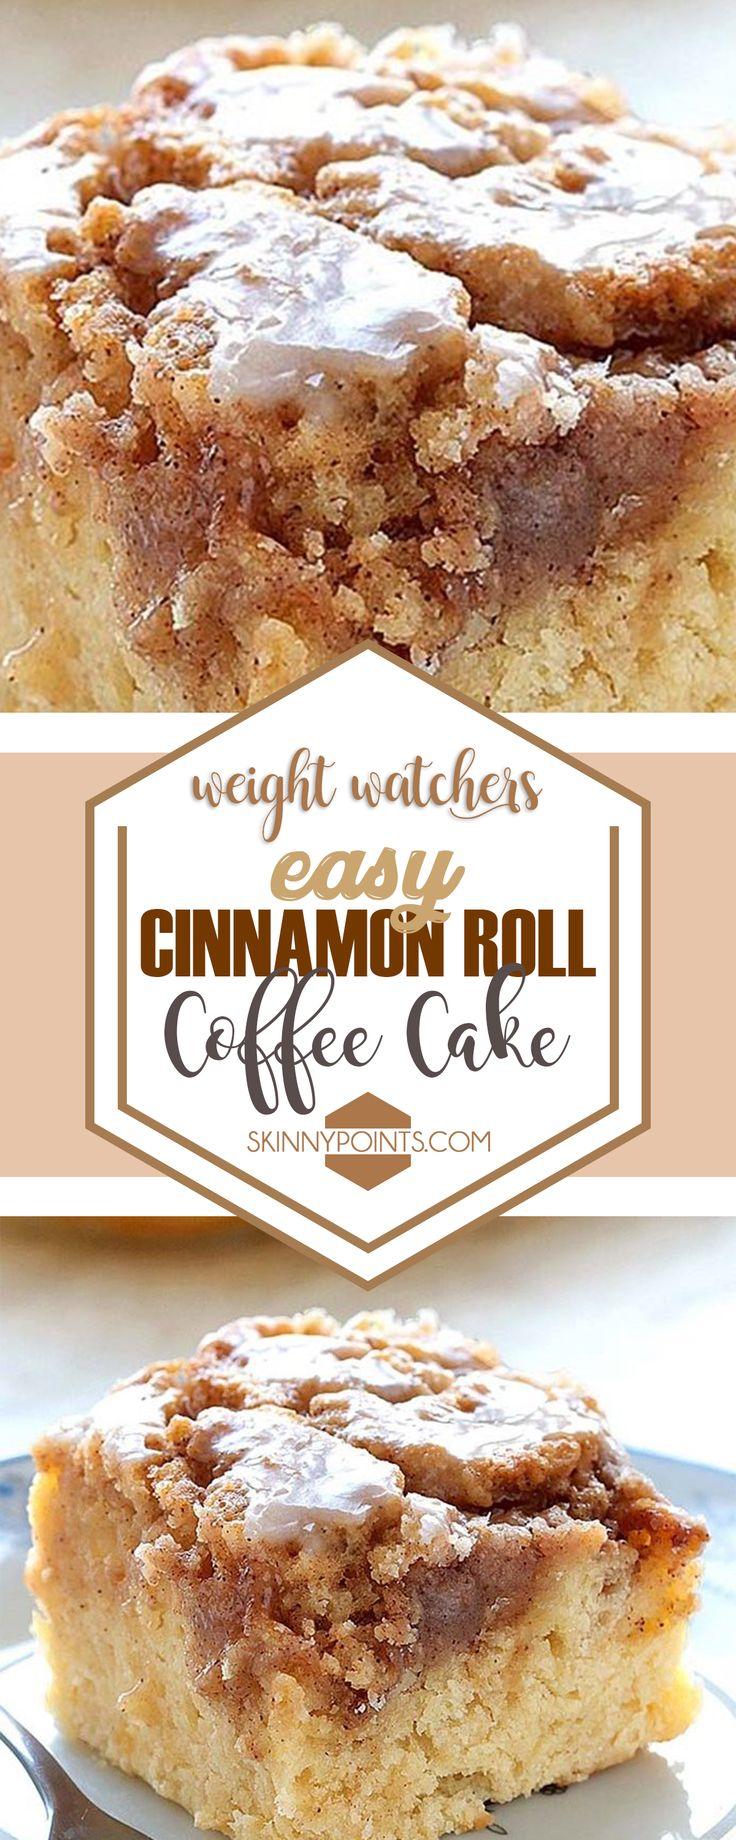 Easy Cinnamon Roll Coffee Cake #weightwatchers #cinnamon #roll #coffee